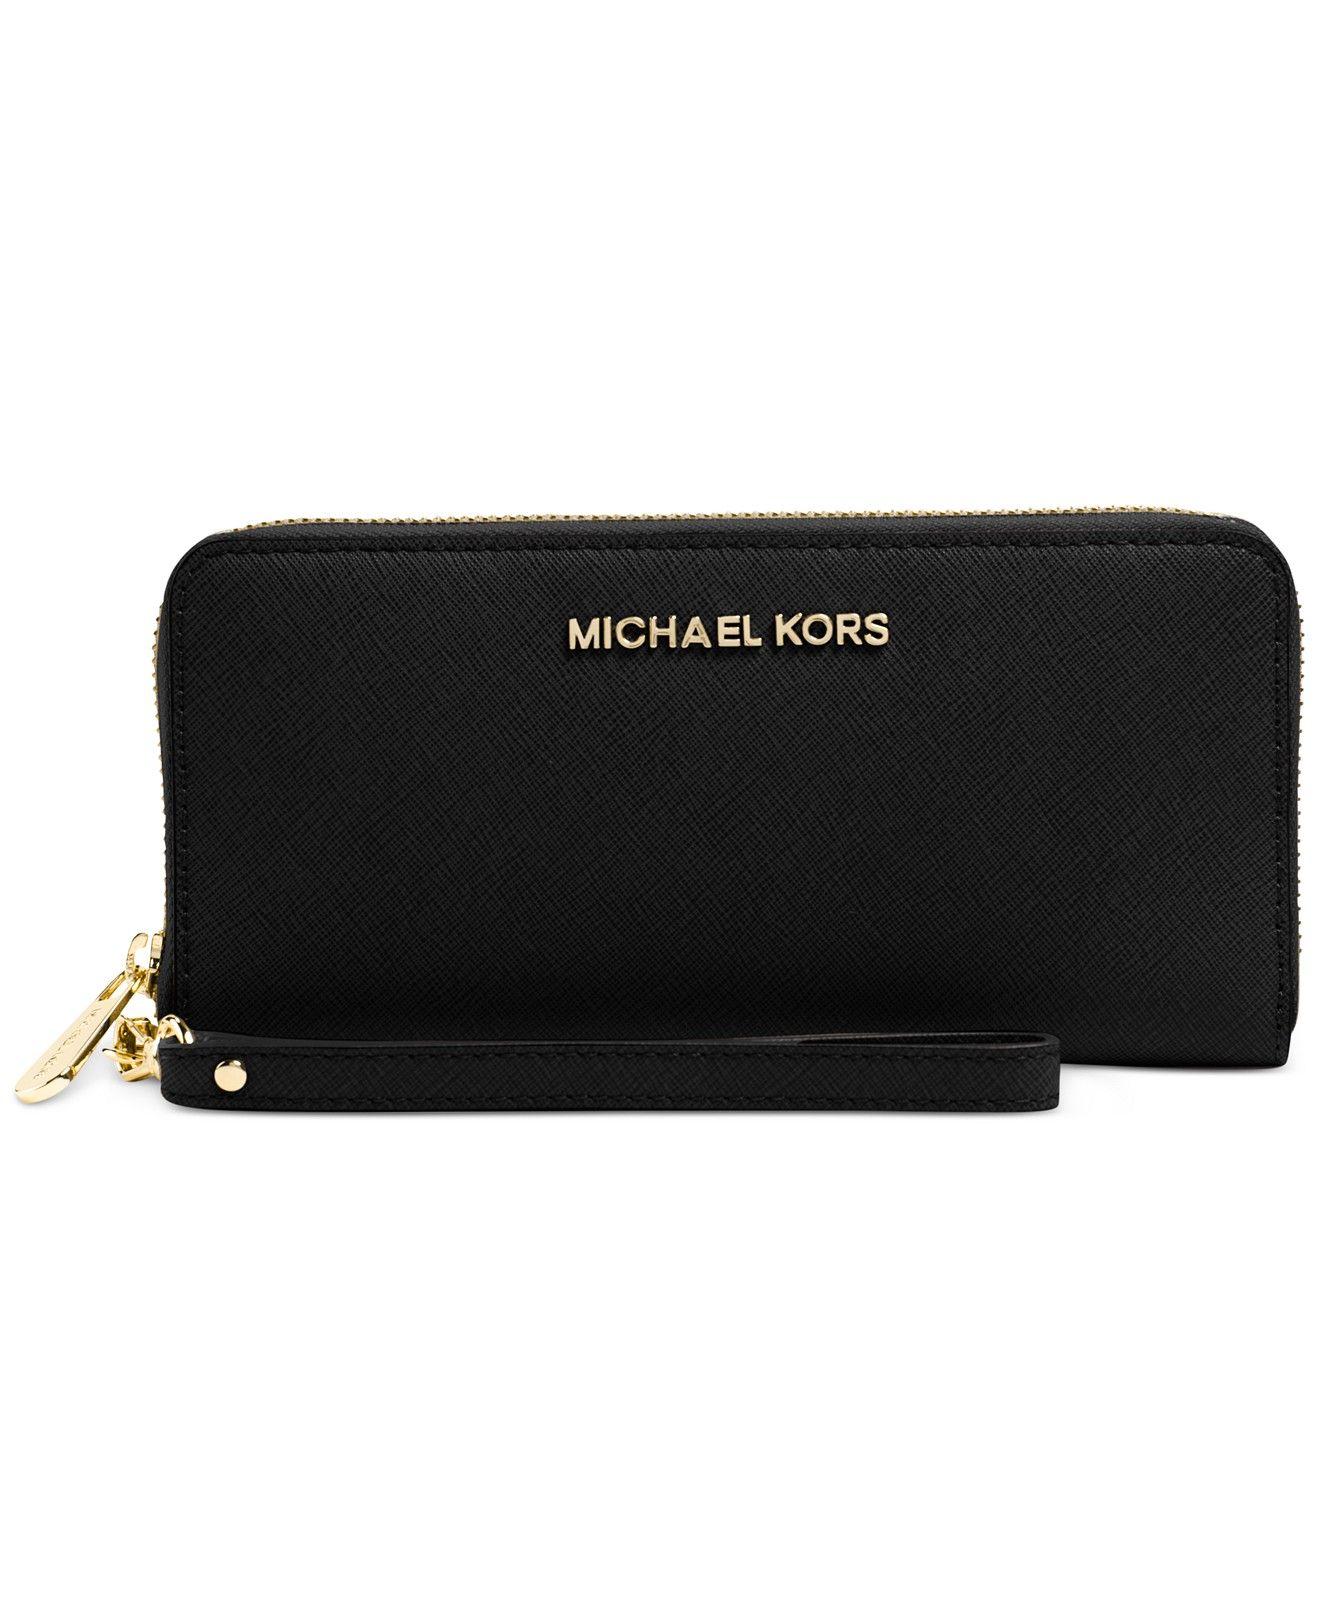 105010f1fa46 MICHAEL Michael Kors Jet Set Travel Tech Continental Wallet - will fit my  phone too